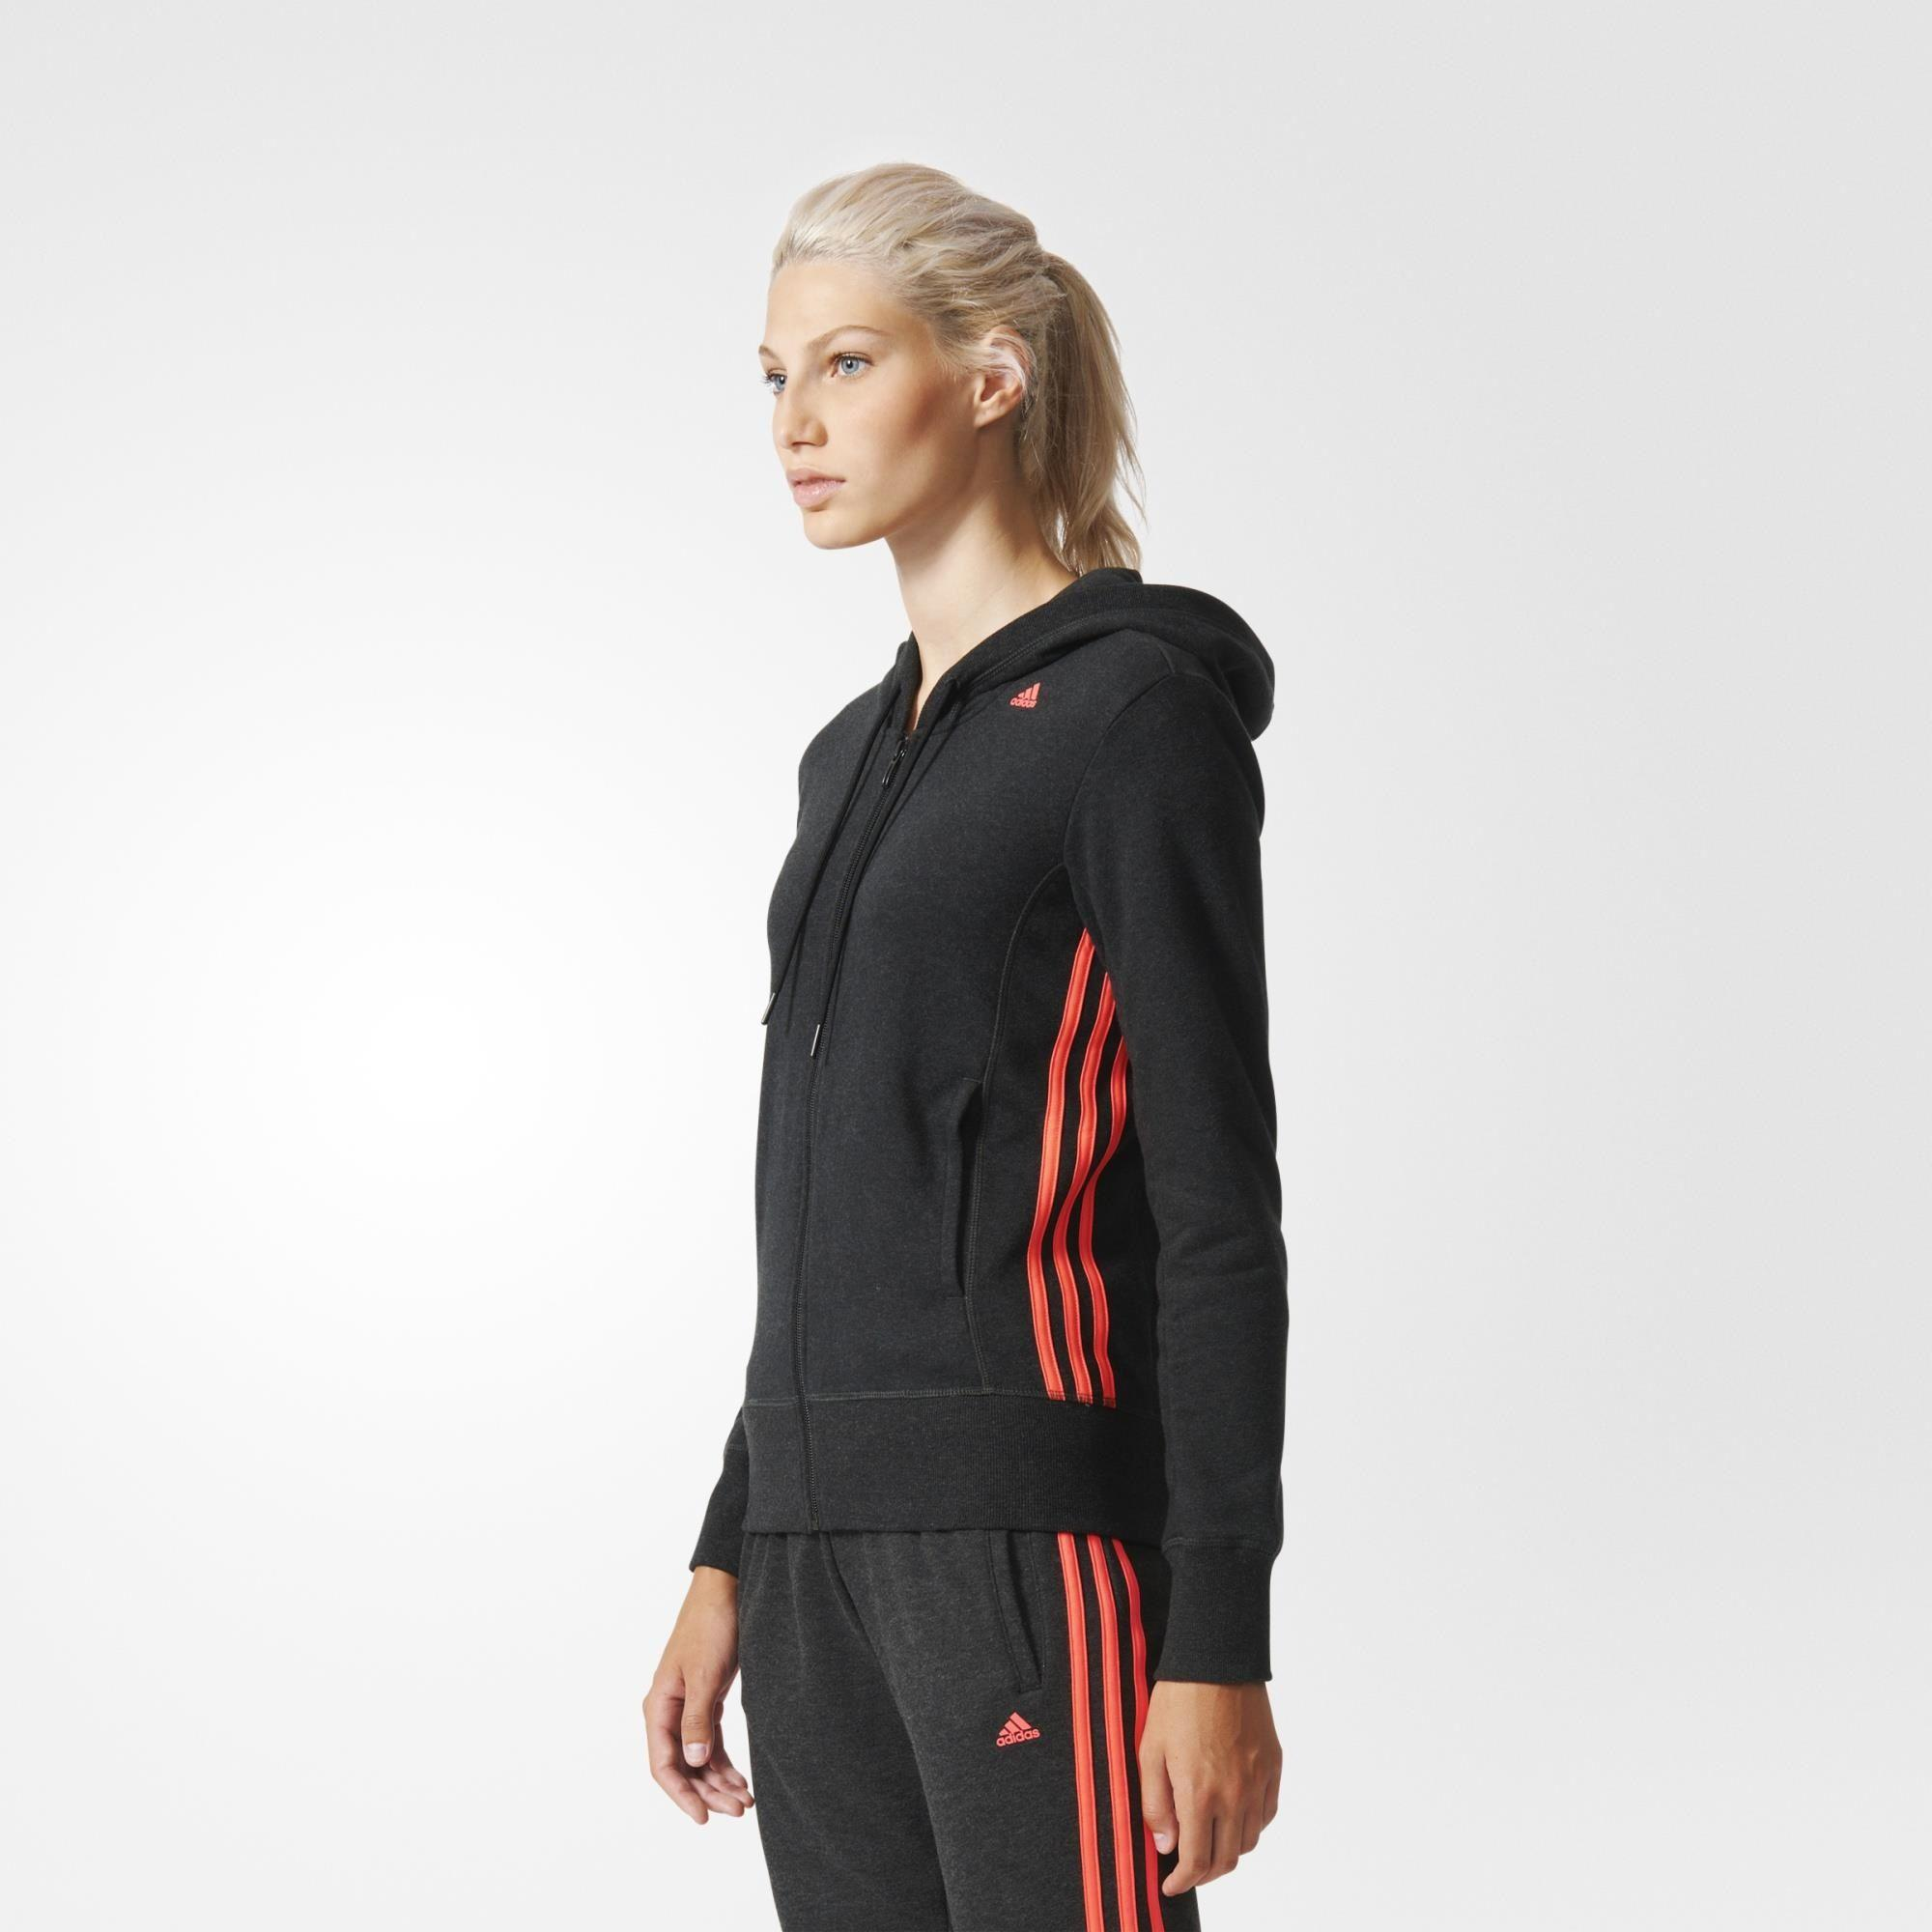 Adidas Womens Essentials Mid 3-Stripes Hoodie - Black - Tennisnuts.com 9c1cdbe89